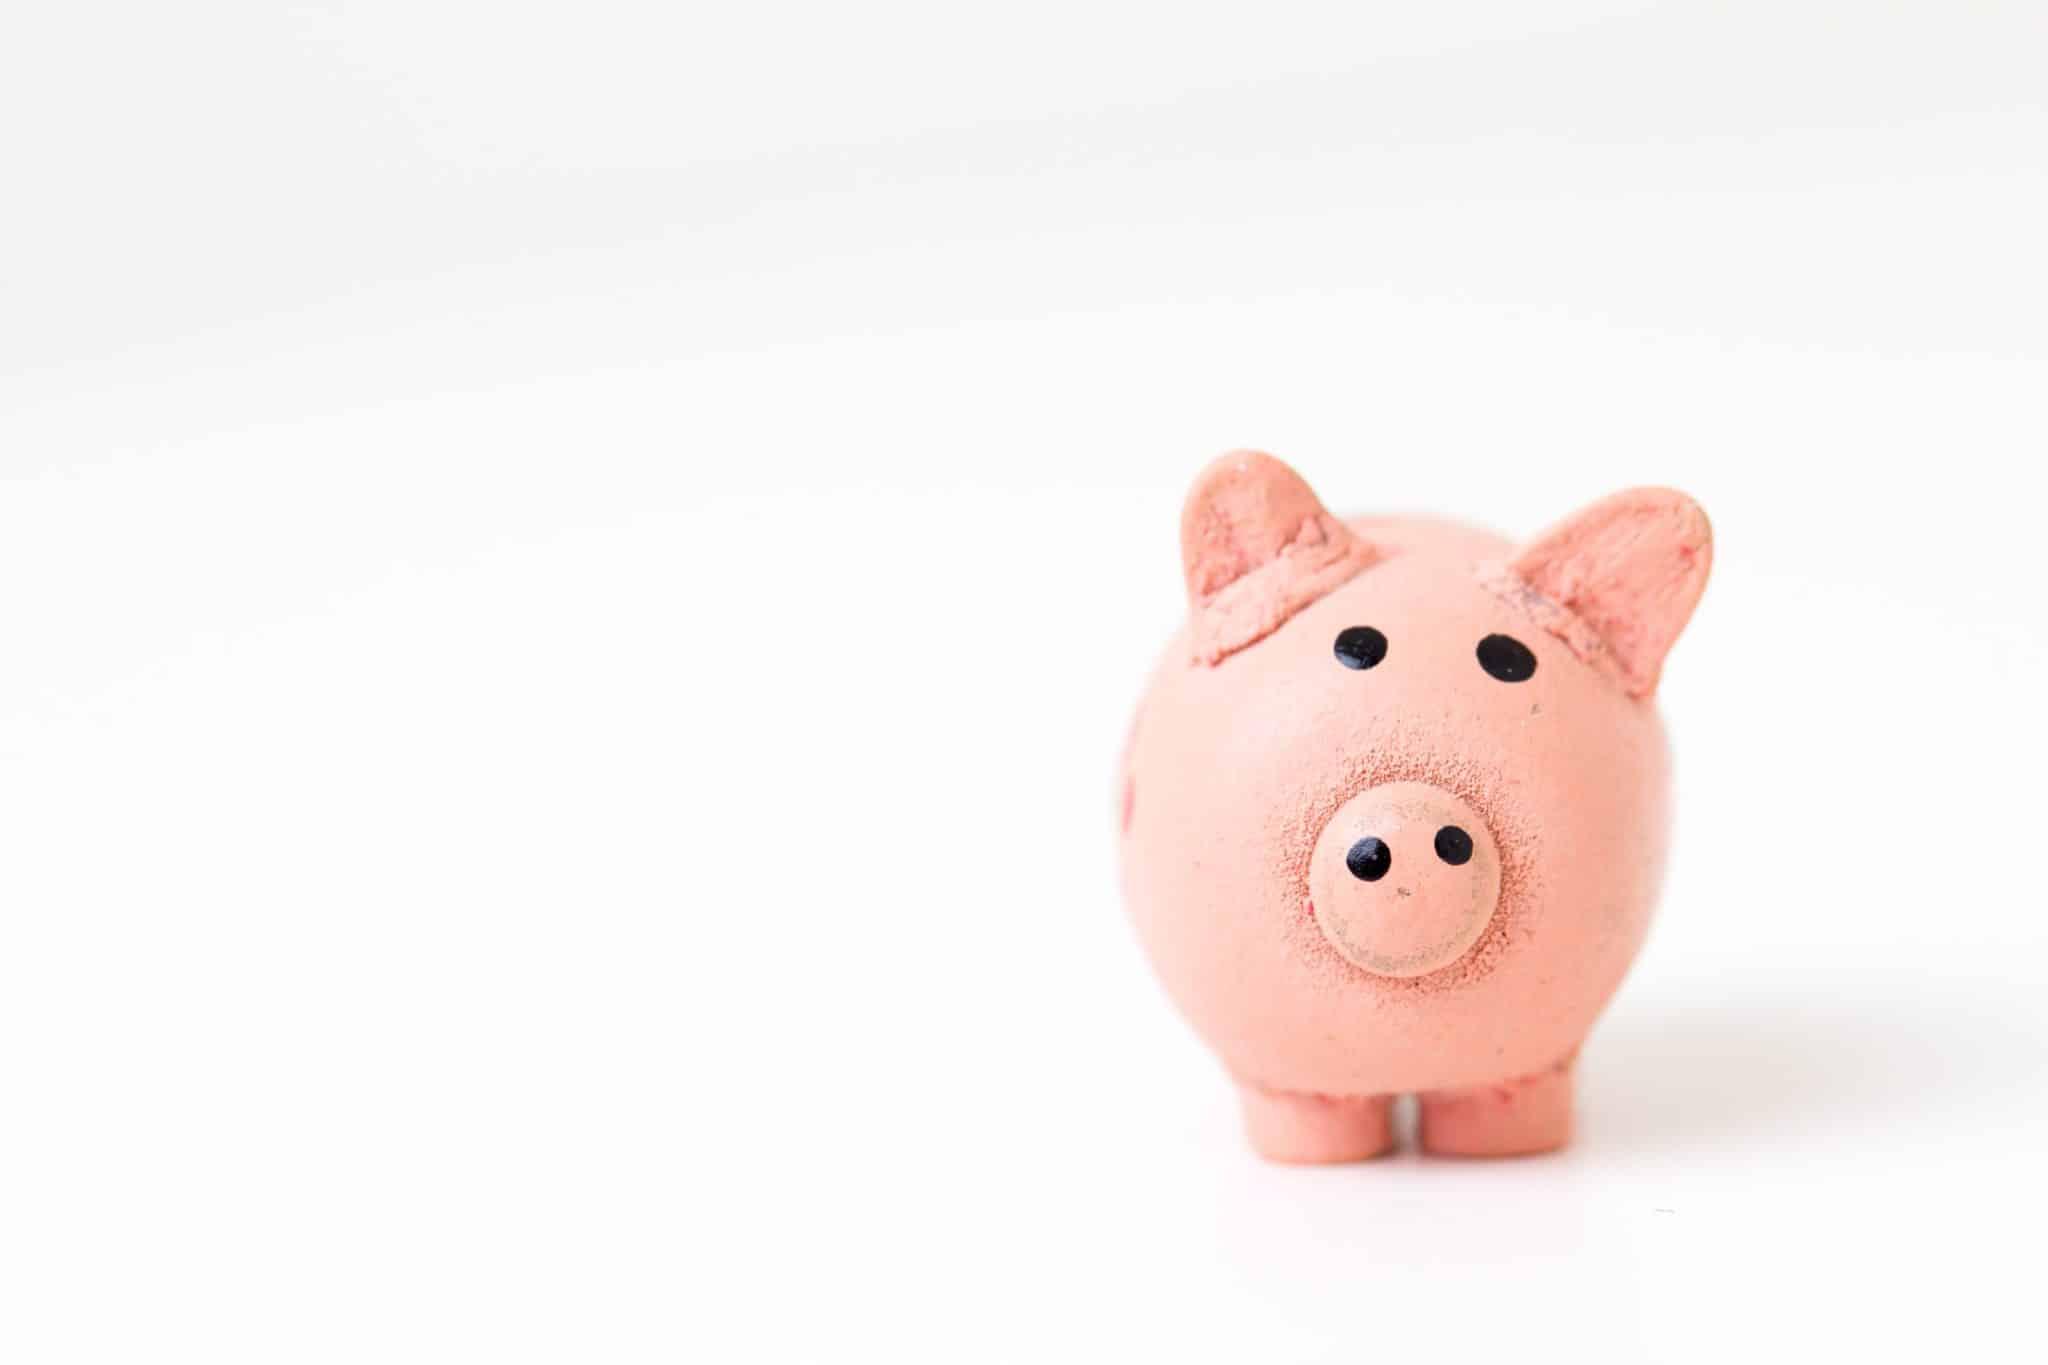 21 Unique Kid Piggy Banks Plus How To Use Them For Money Lessons